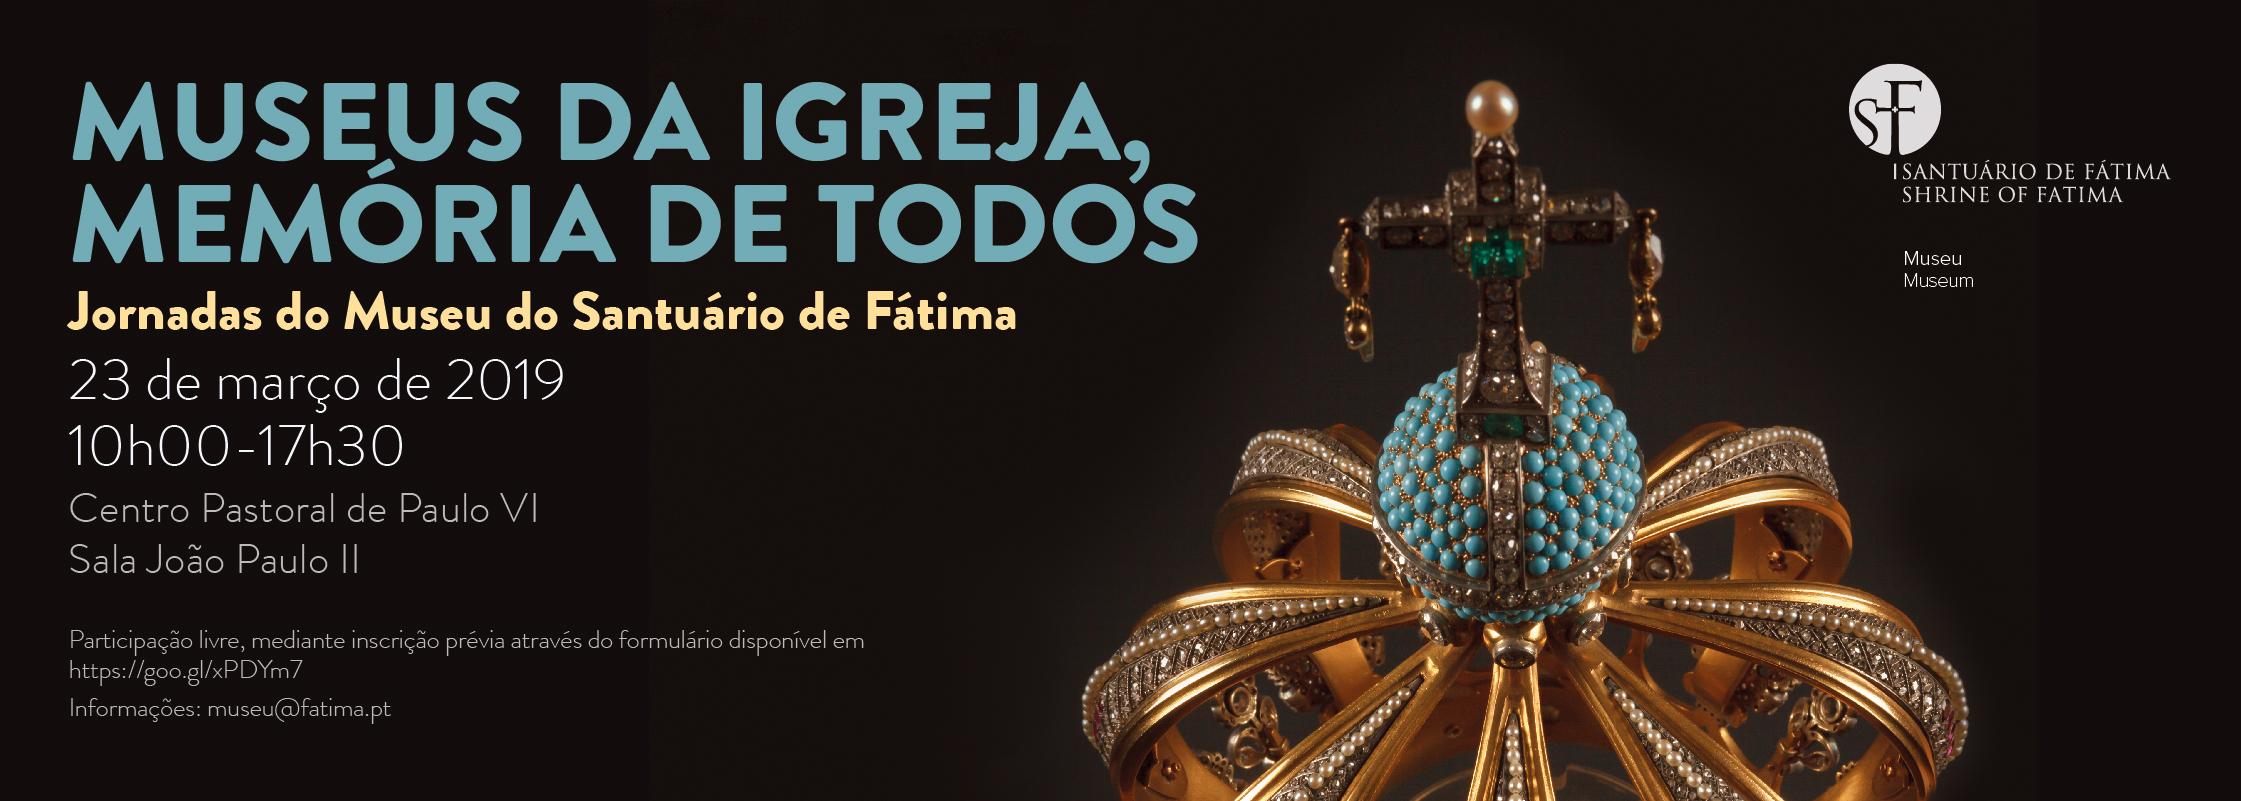 2019-02-15_Jornadas_Museu_web_1.jpg